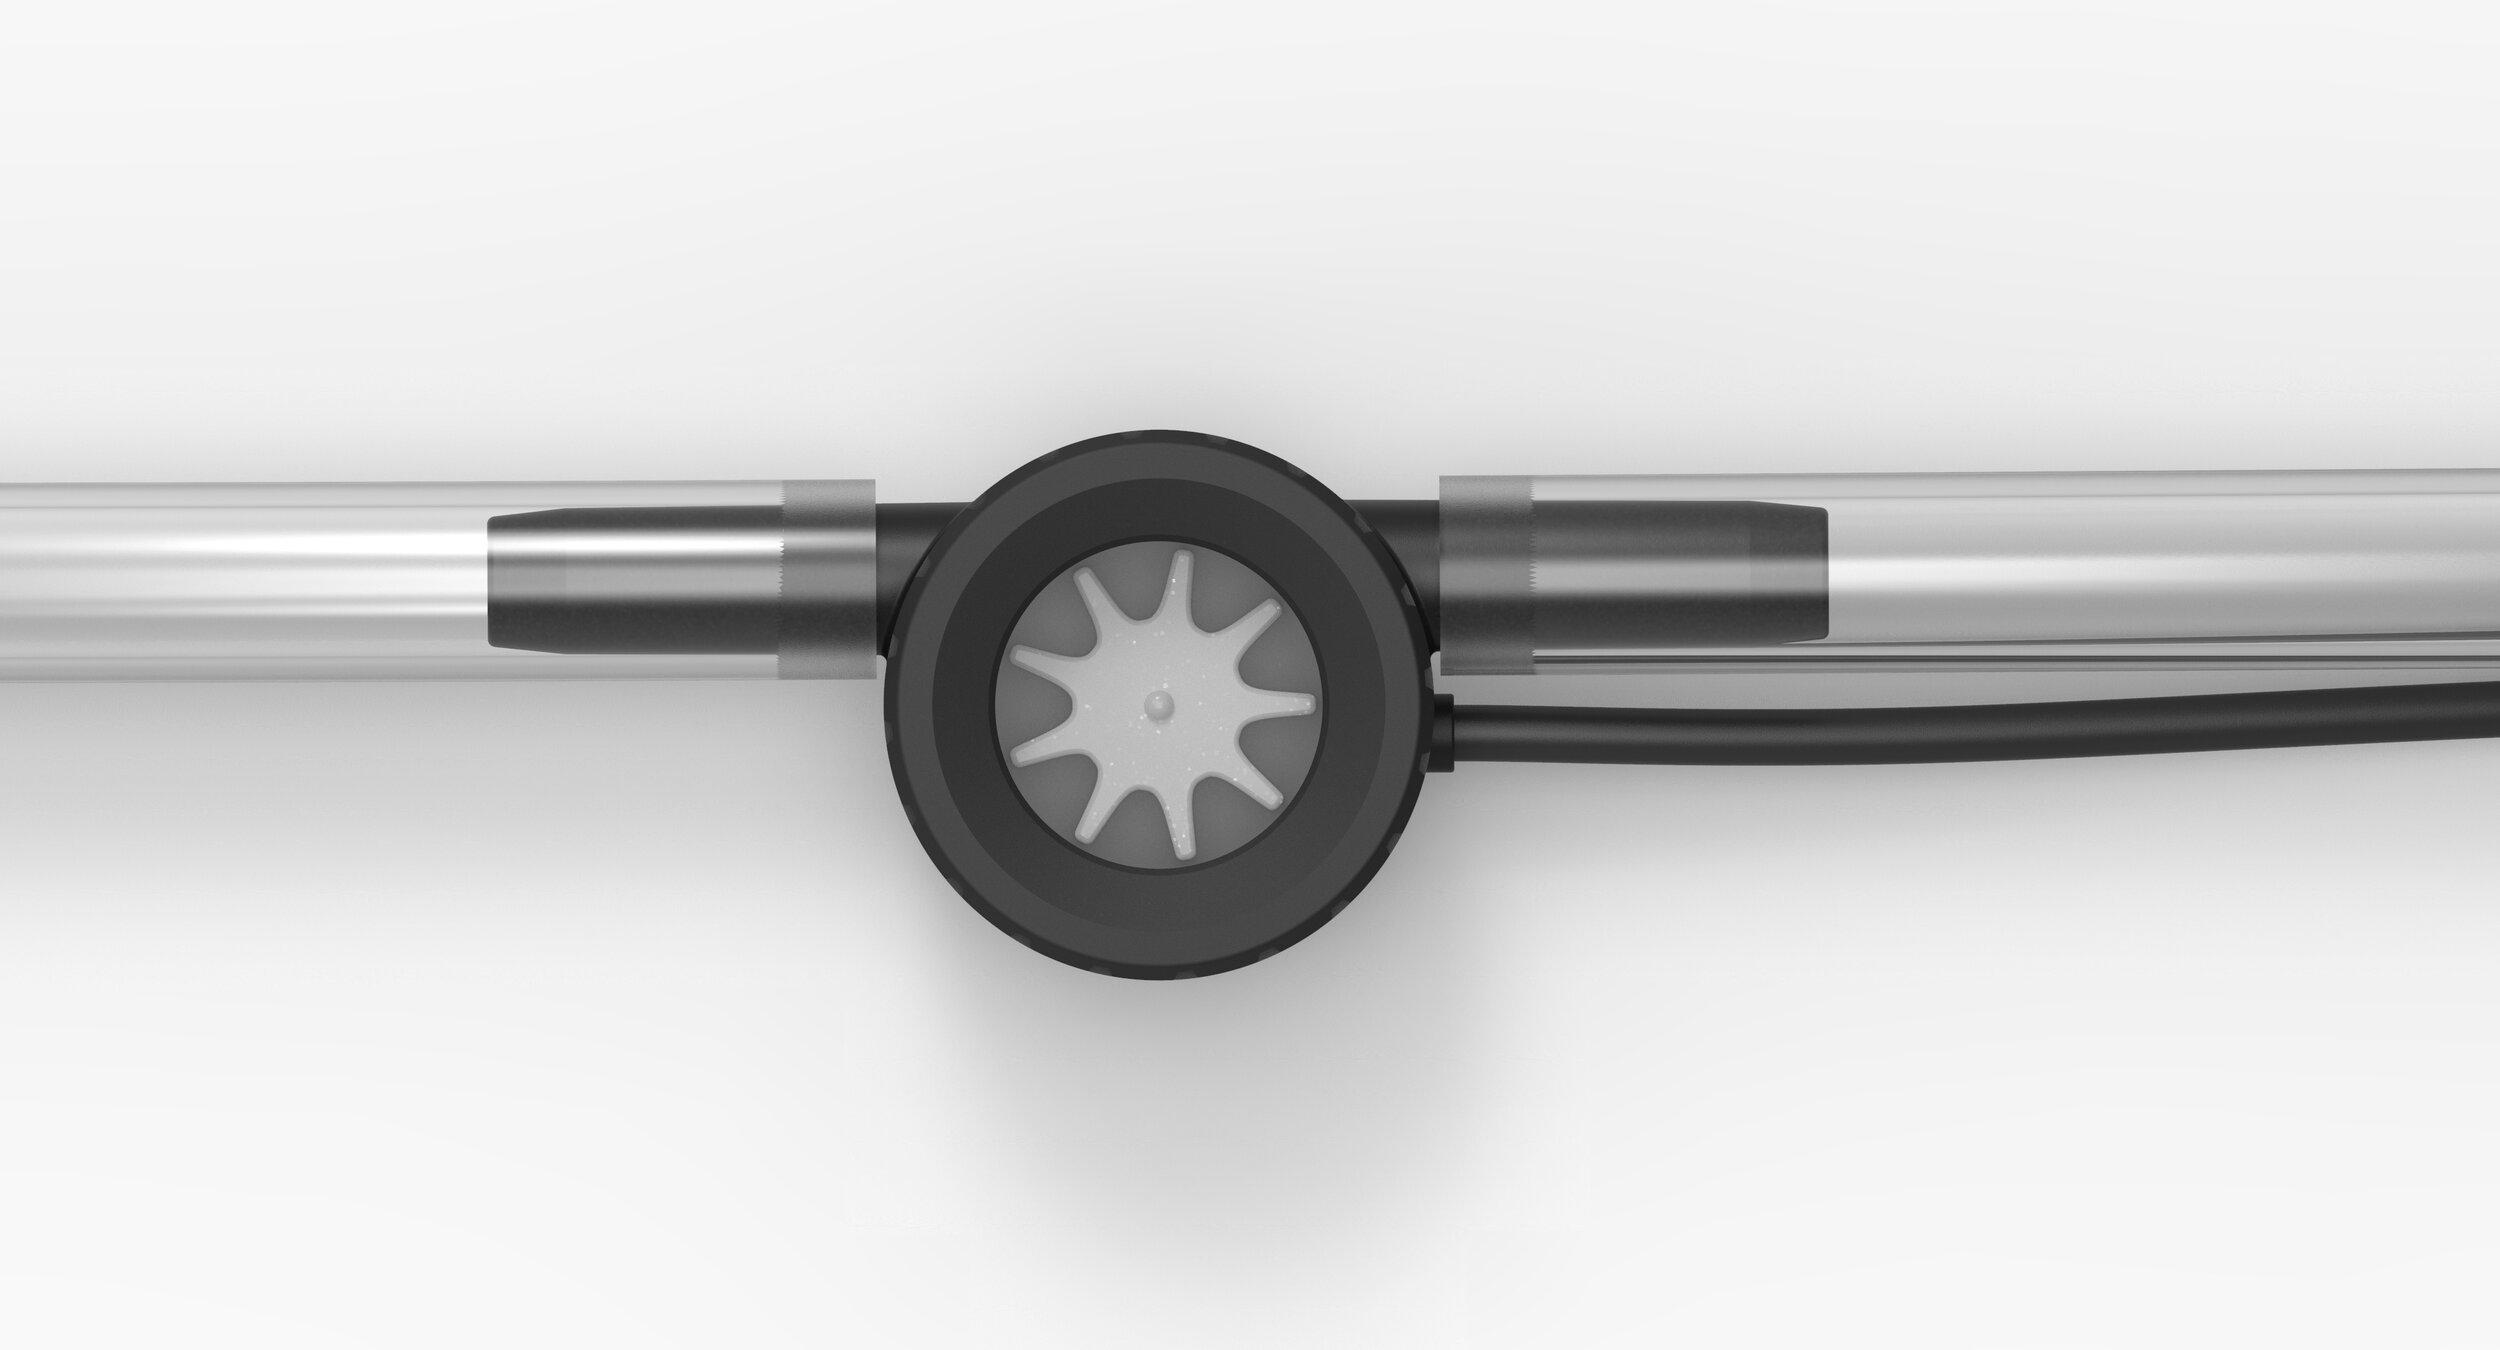 190926_Flowmeter-6.jpg